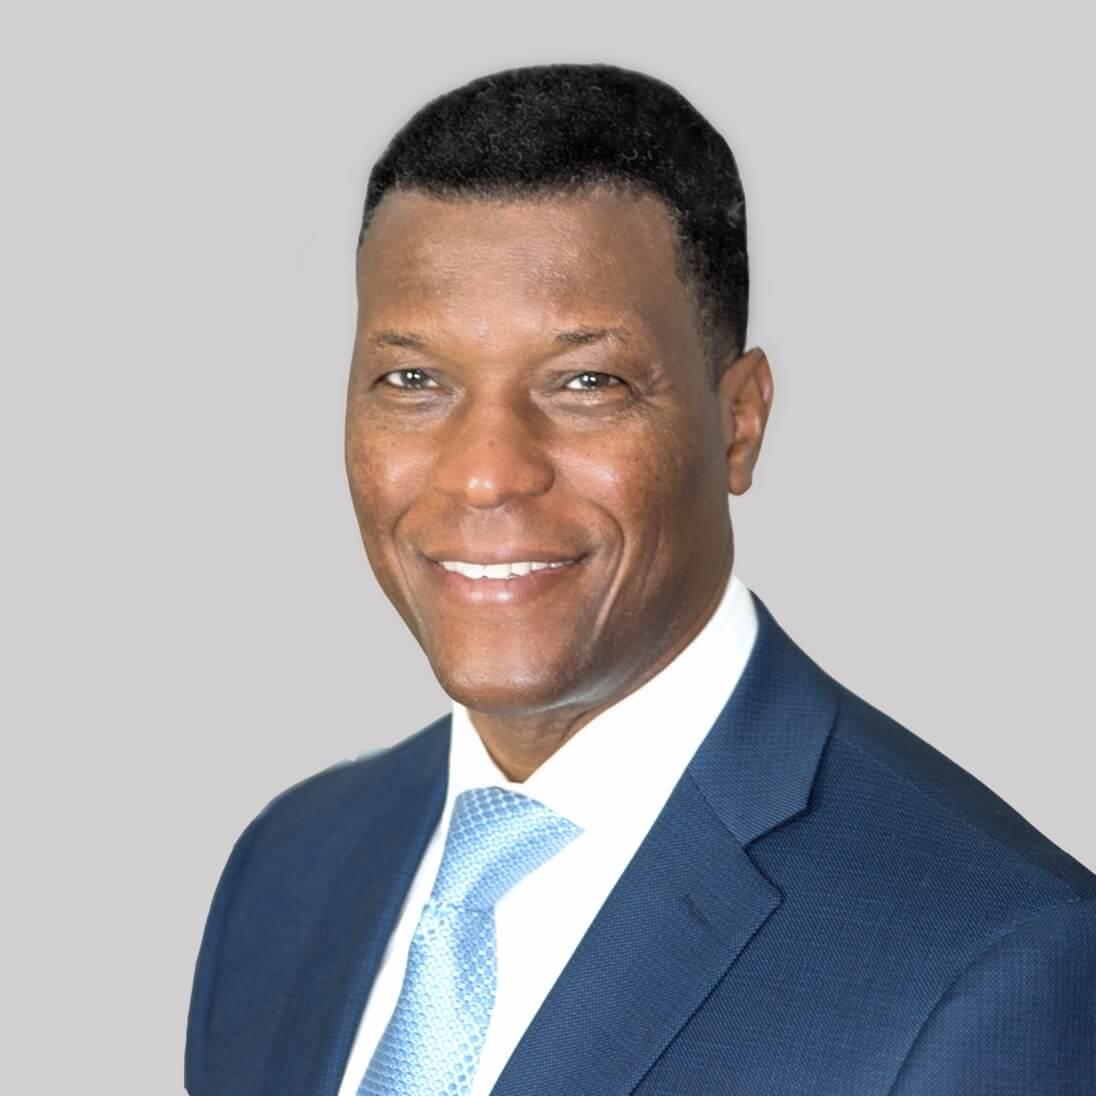 Mike Kelly, CFP Cincinnati, OH Kelly Financial Planning, LLC